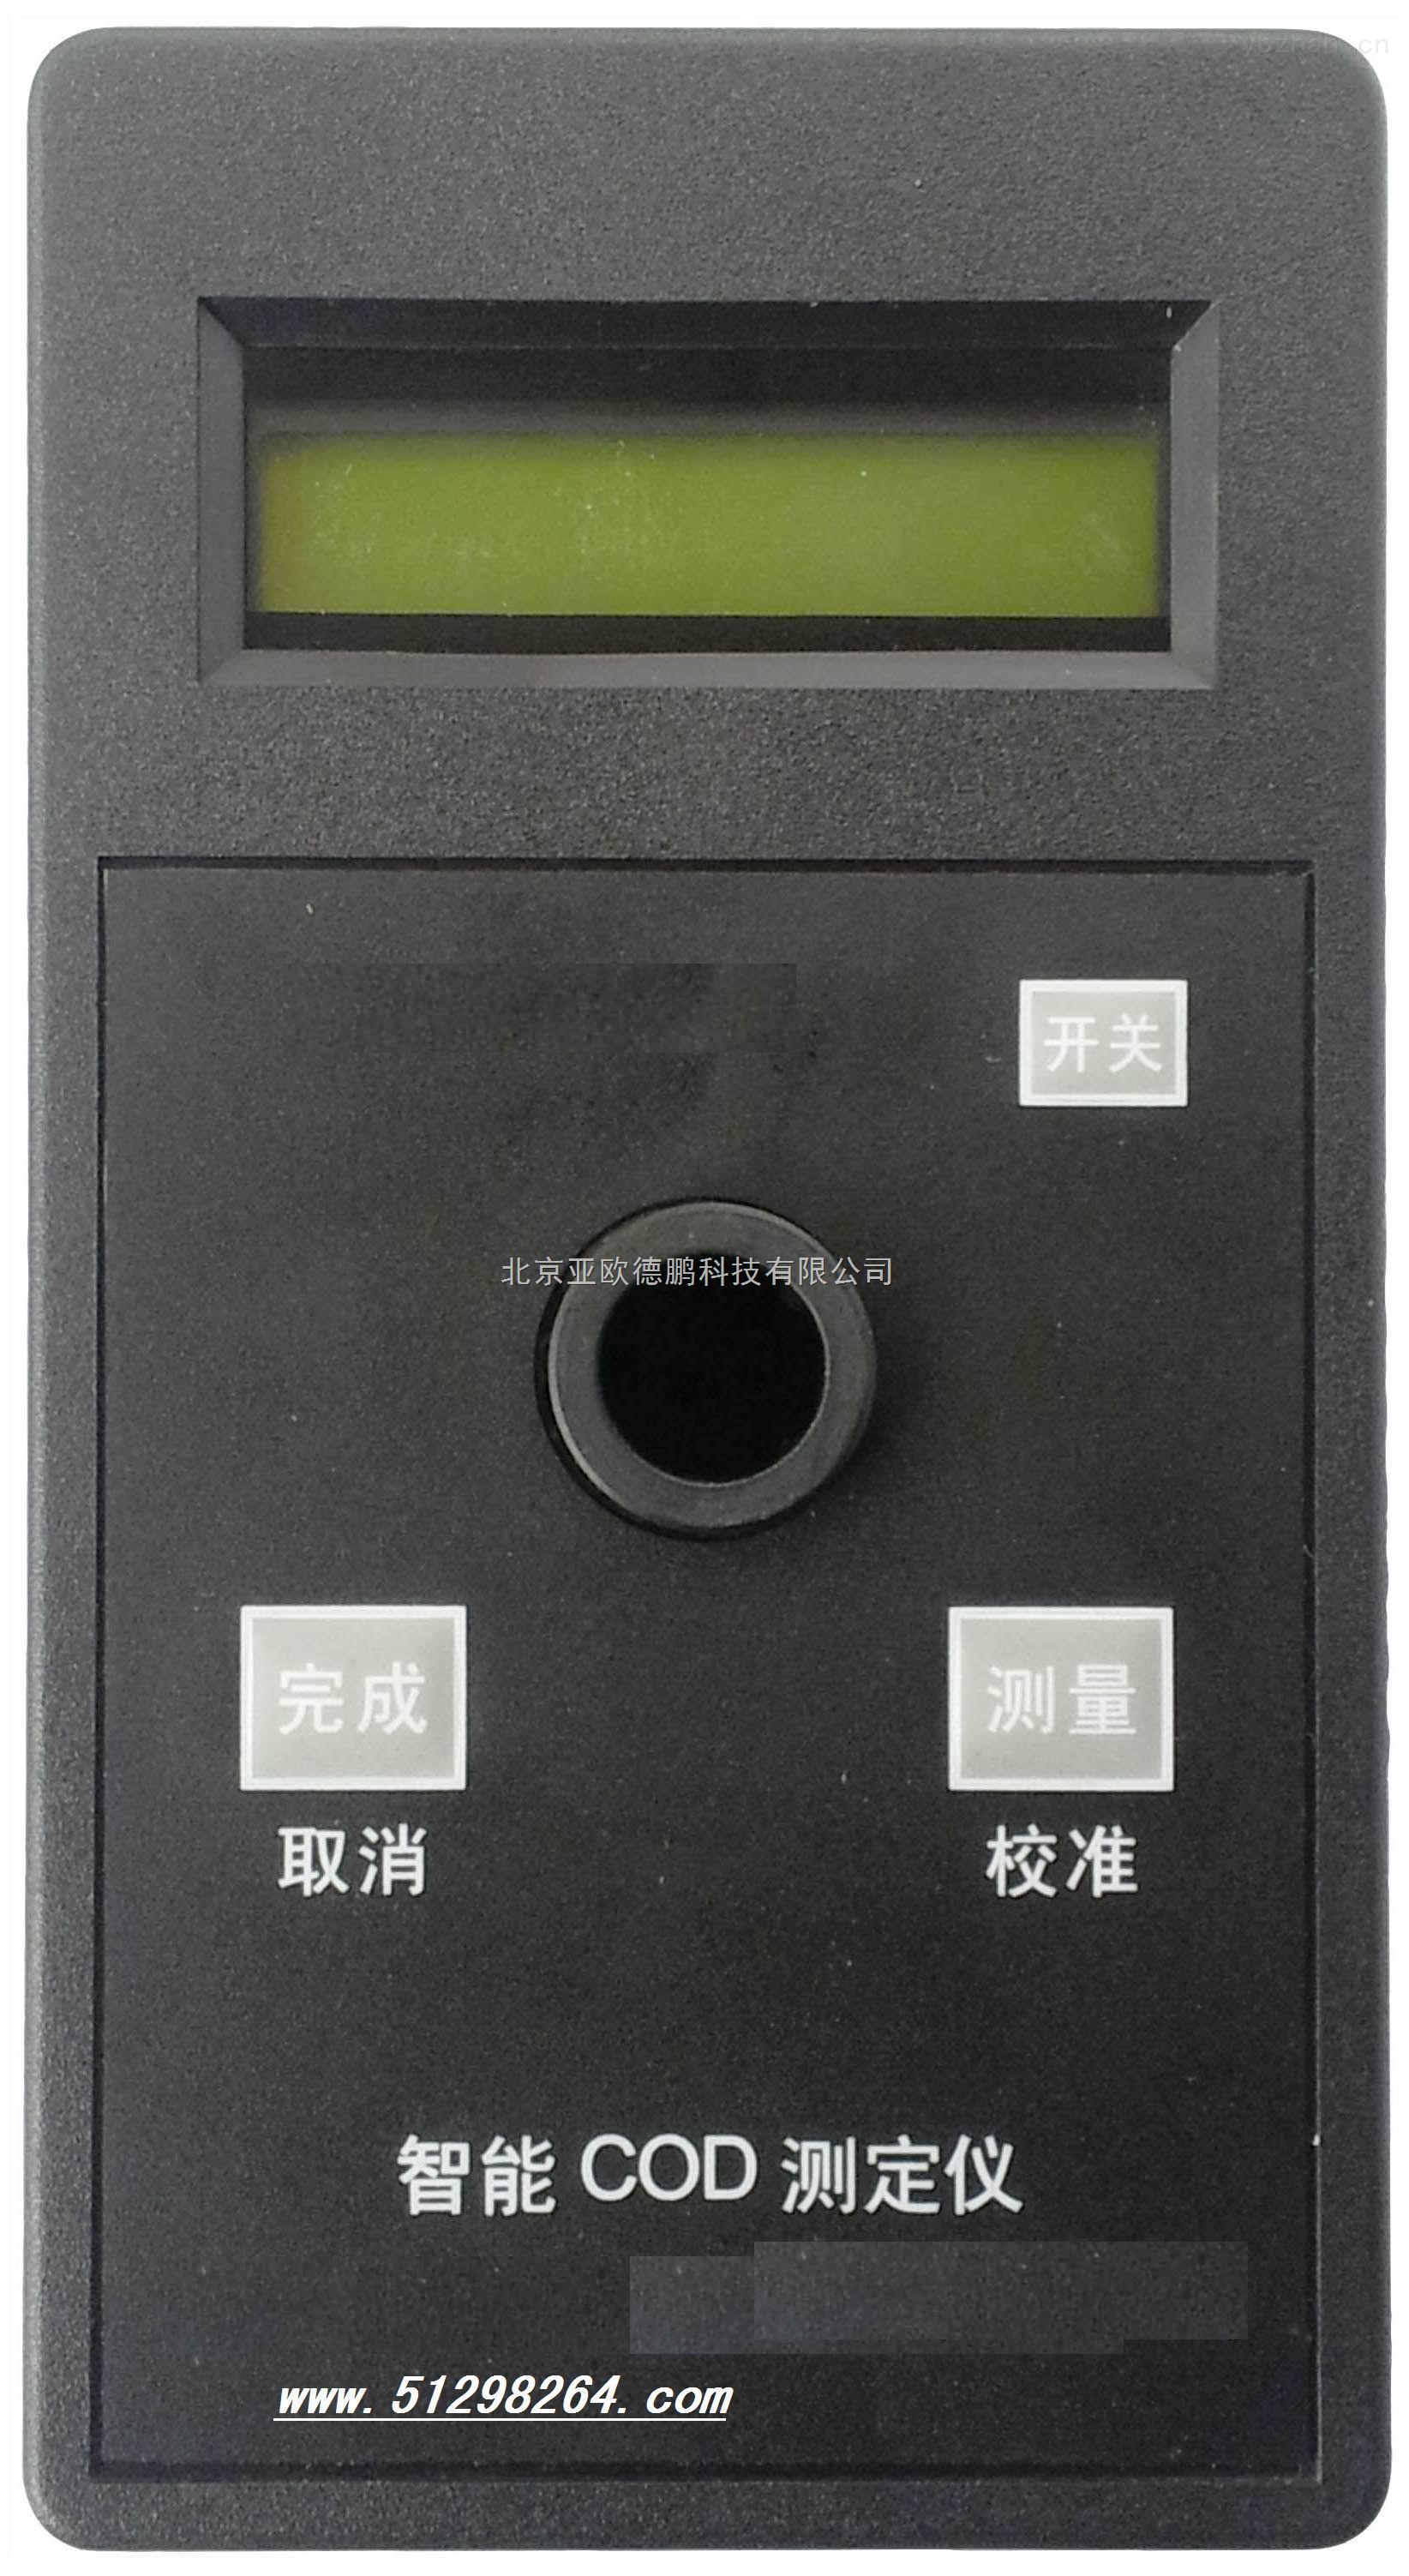 DP-04-01-智能COD水質測定儀/COD水質測定儀/COD測定儀/檢測儀/